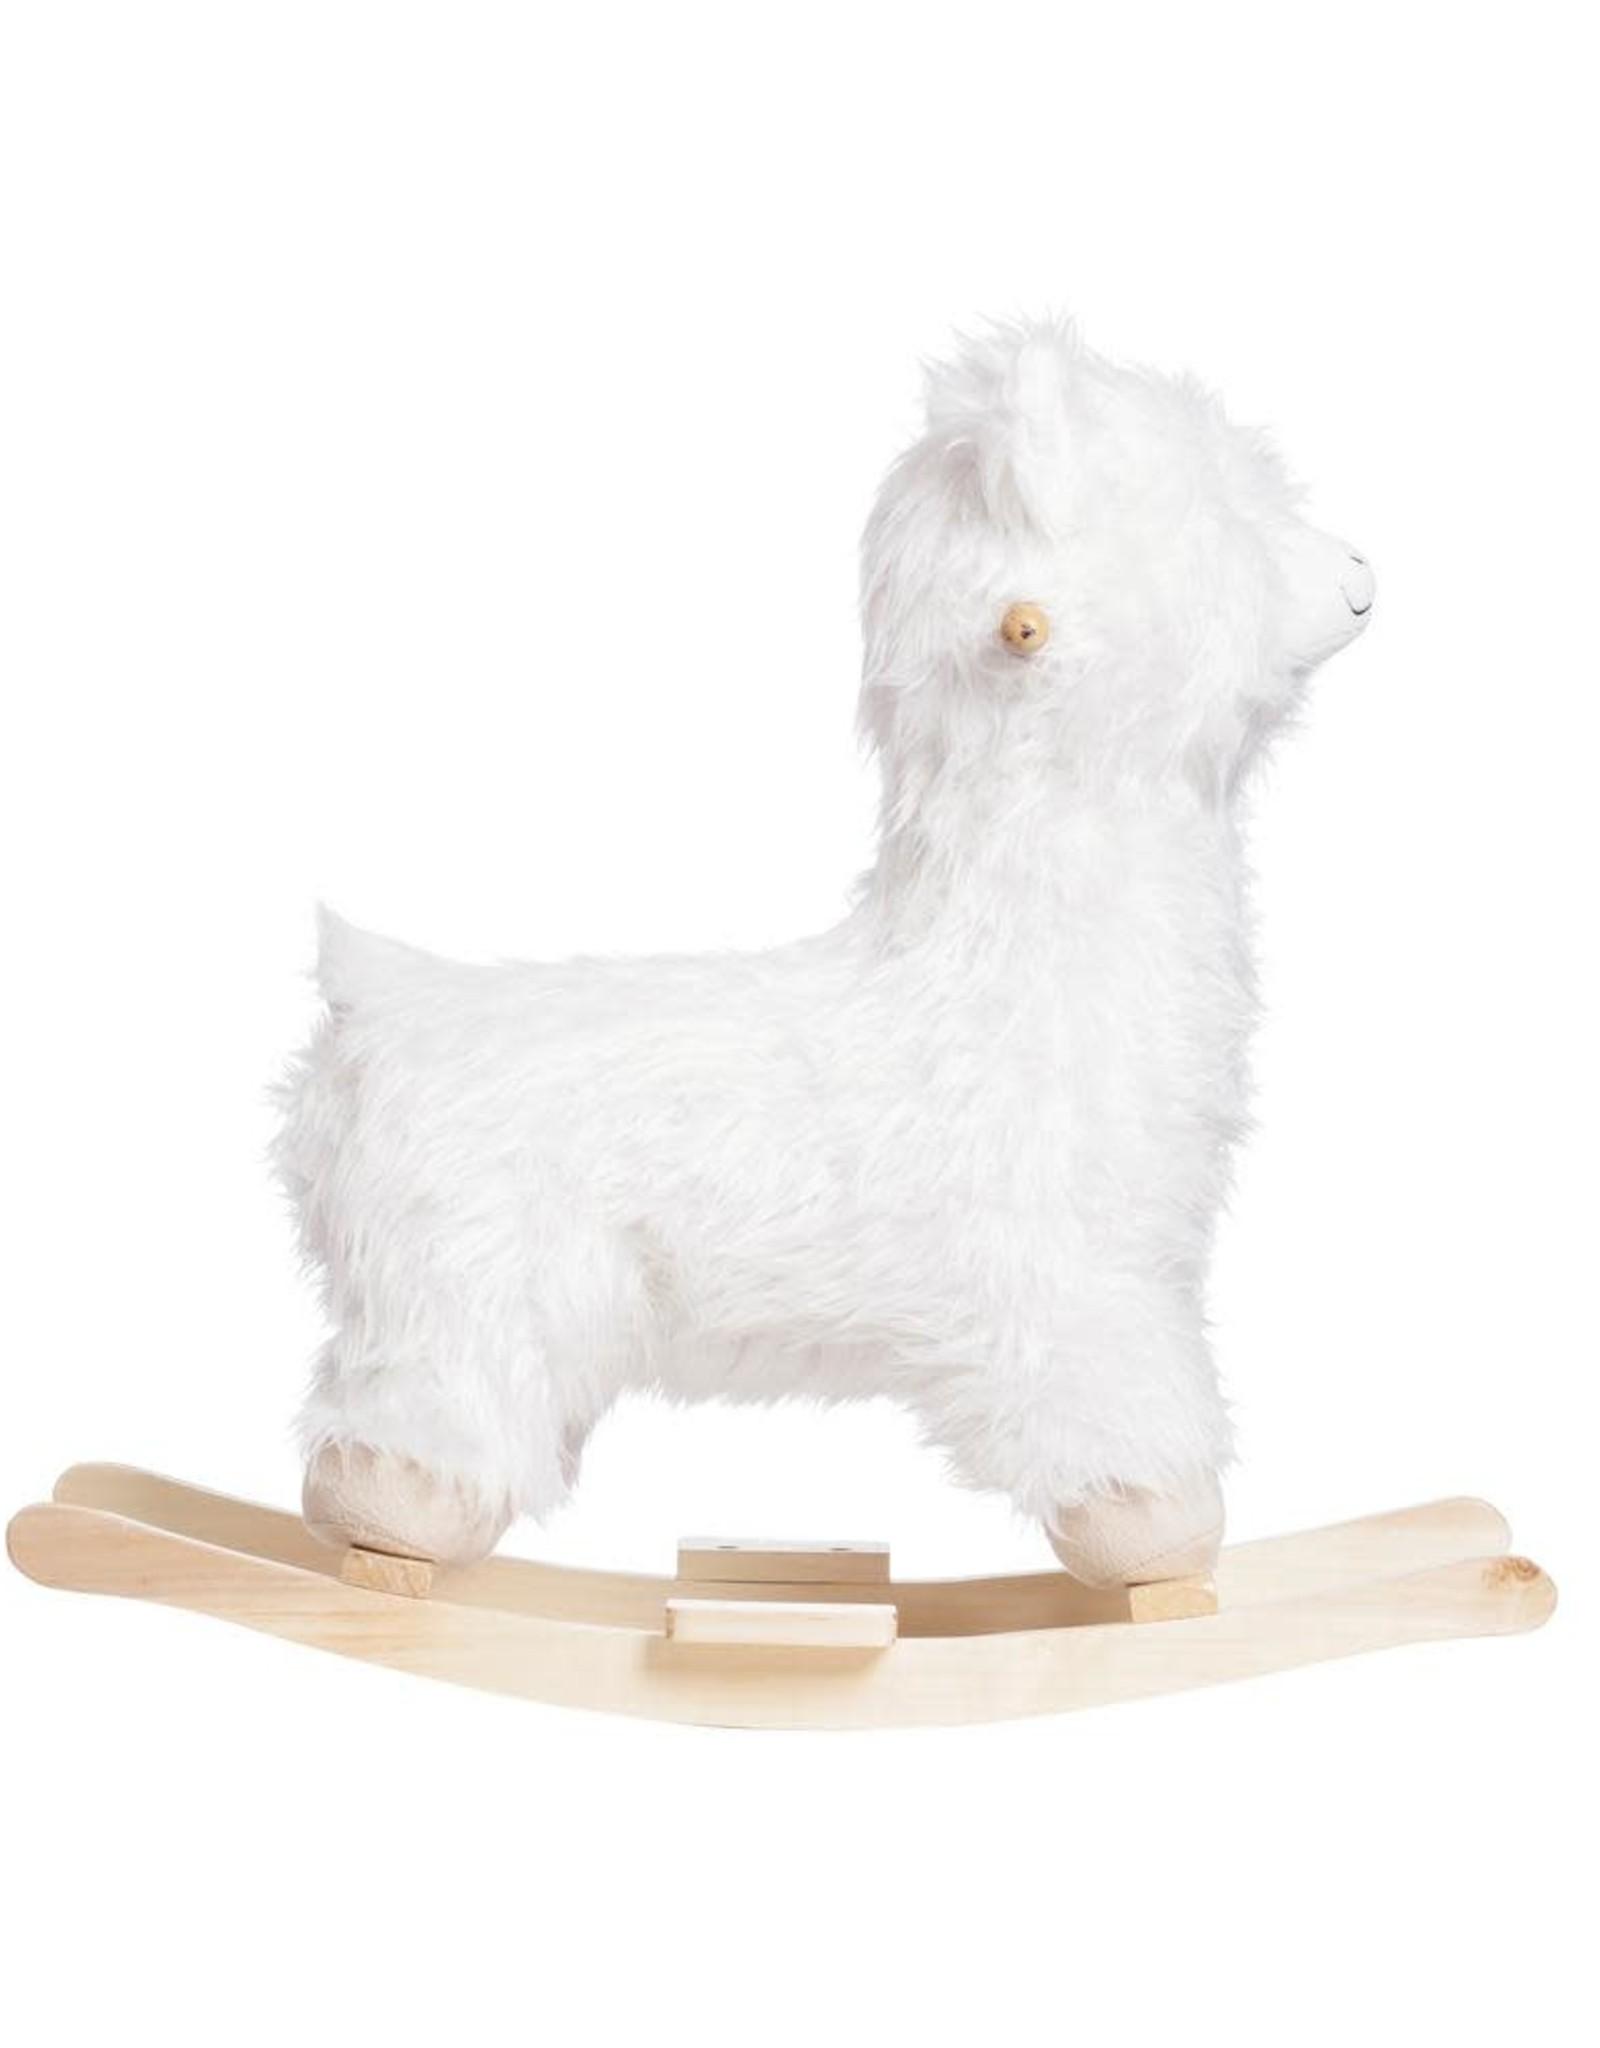 creativeco-op Rocking chair - Llama